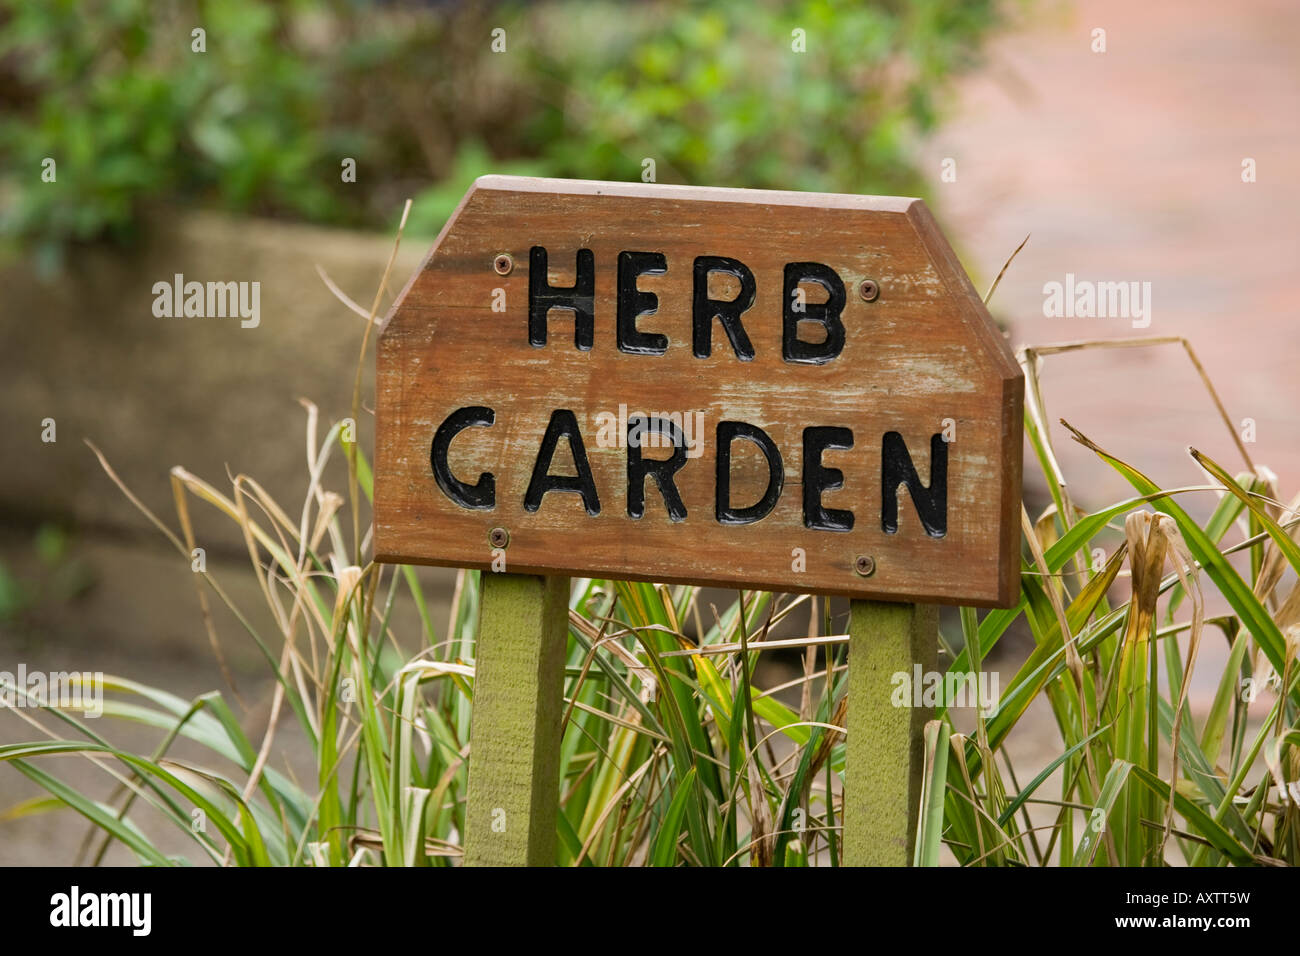 Sign Herb Garden Stock Photos & Sign Herb Garden Stock Images - Alamy